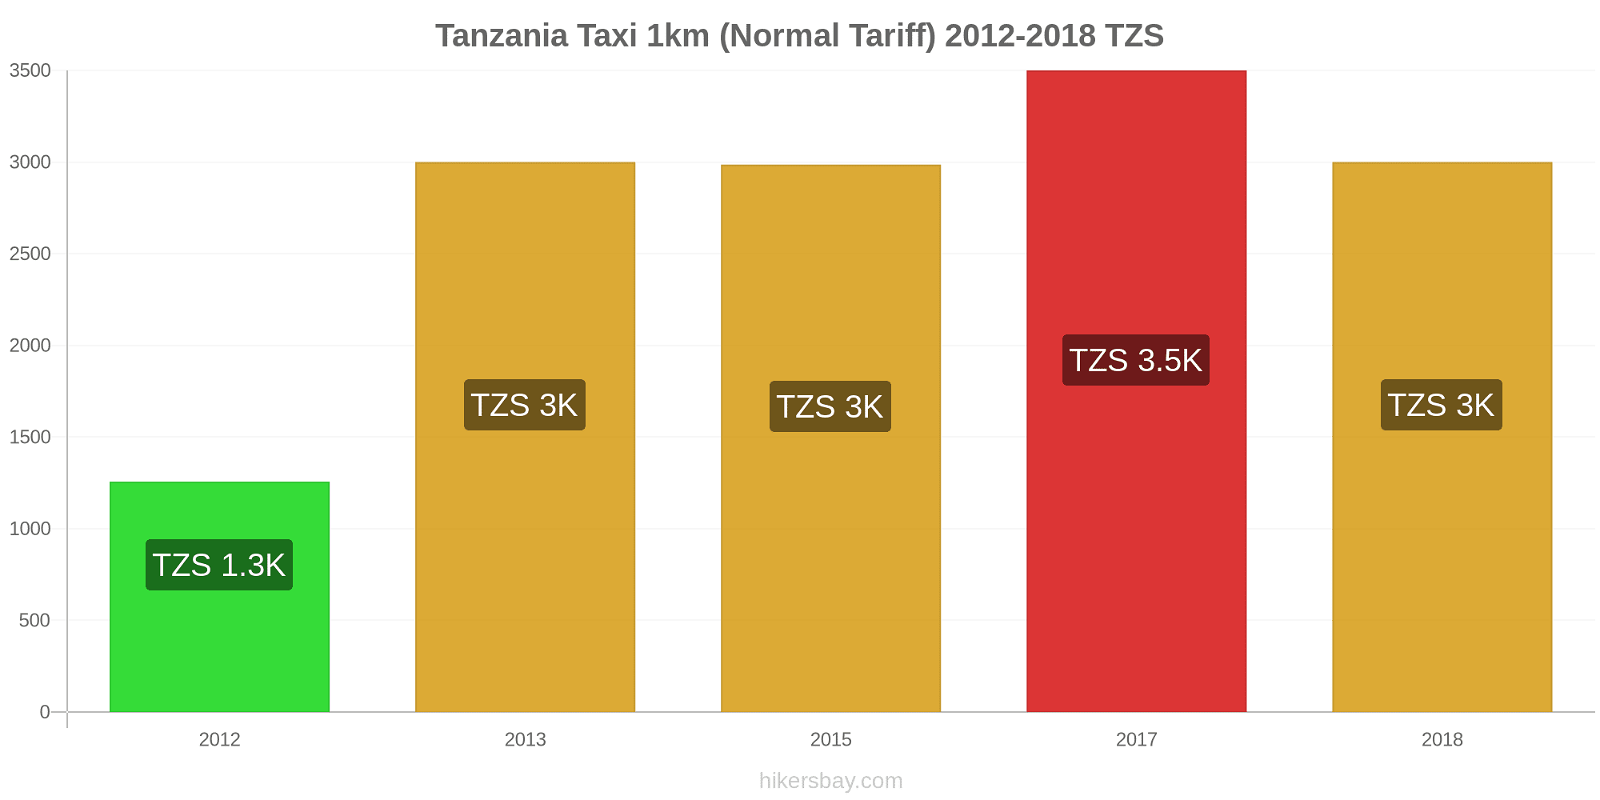 Tanzania price changes Taxi 1km (Normal Tariff) hikersbay.com